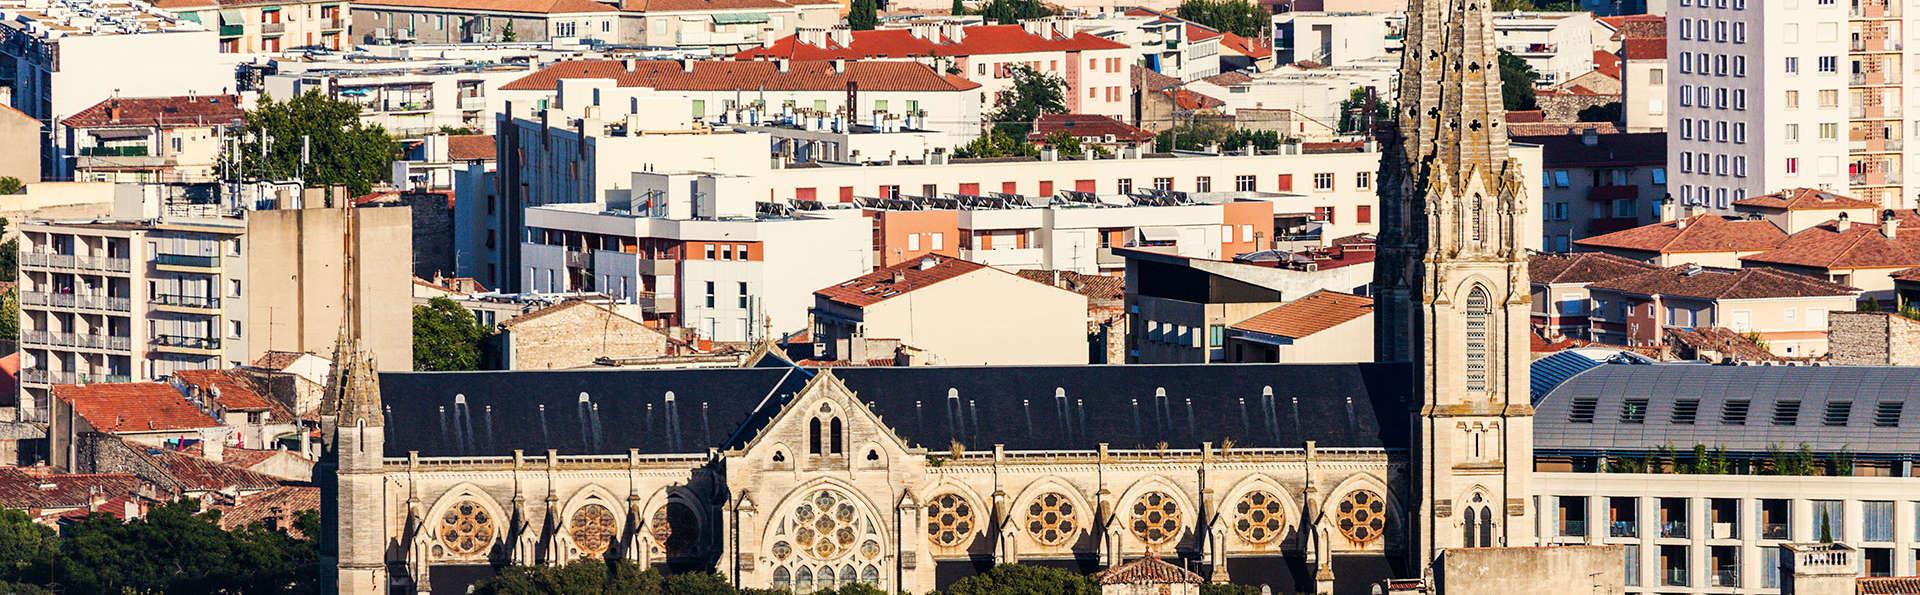 Royal Hôtel - Nîmes  - Edit_Nimes3.jpg